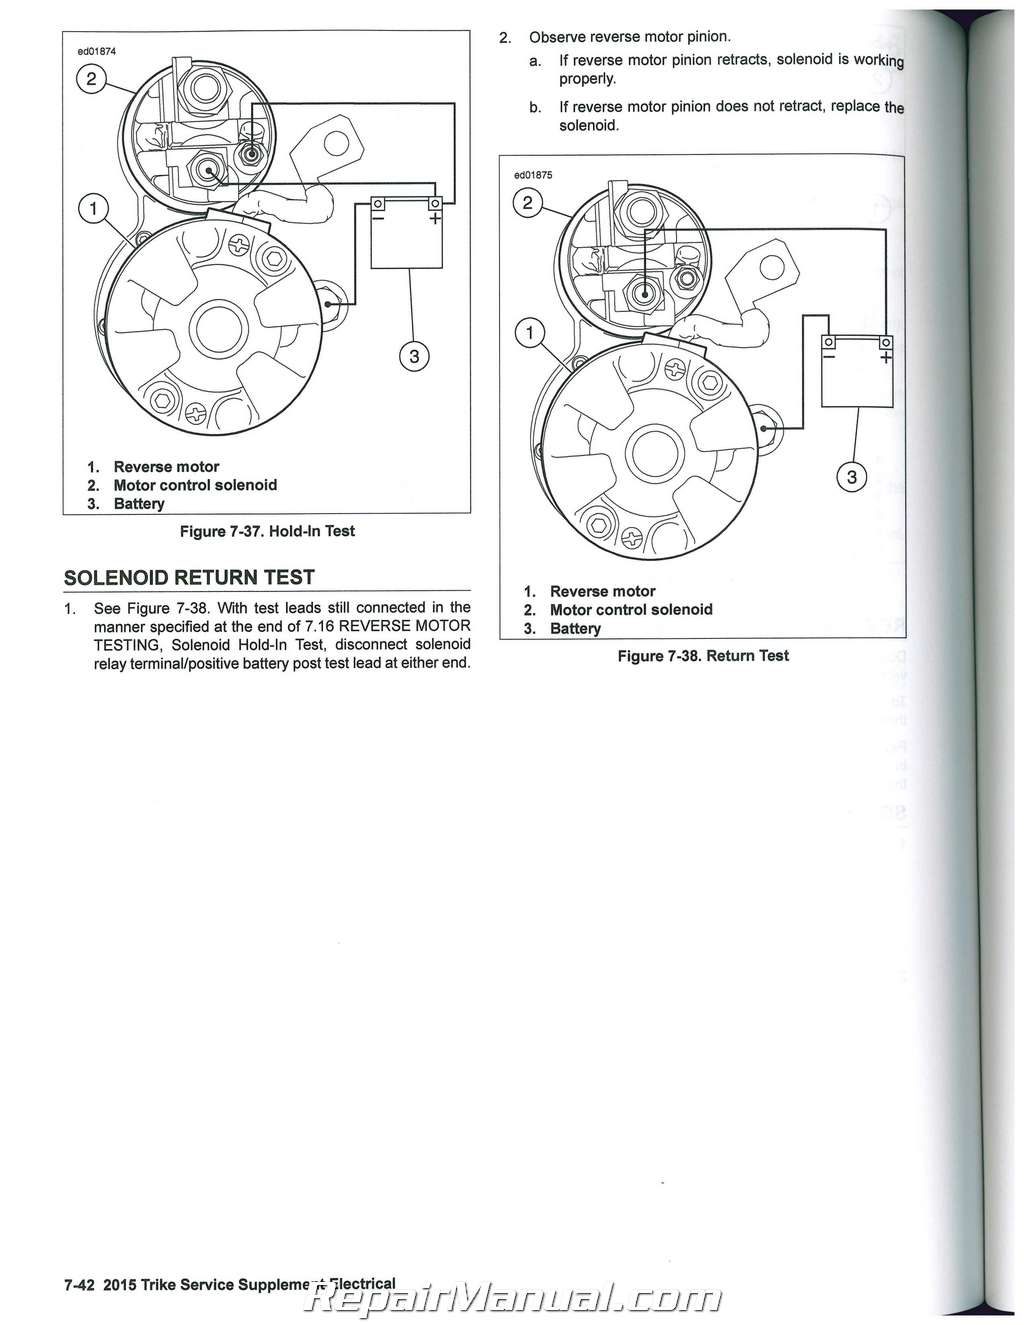 2015 Harley Davidson Trike Service Manual Supplement Wiring Diagram For